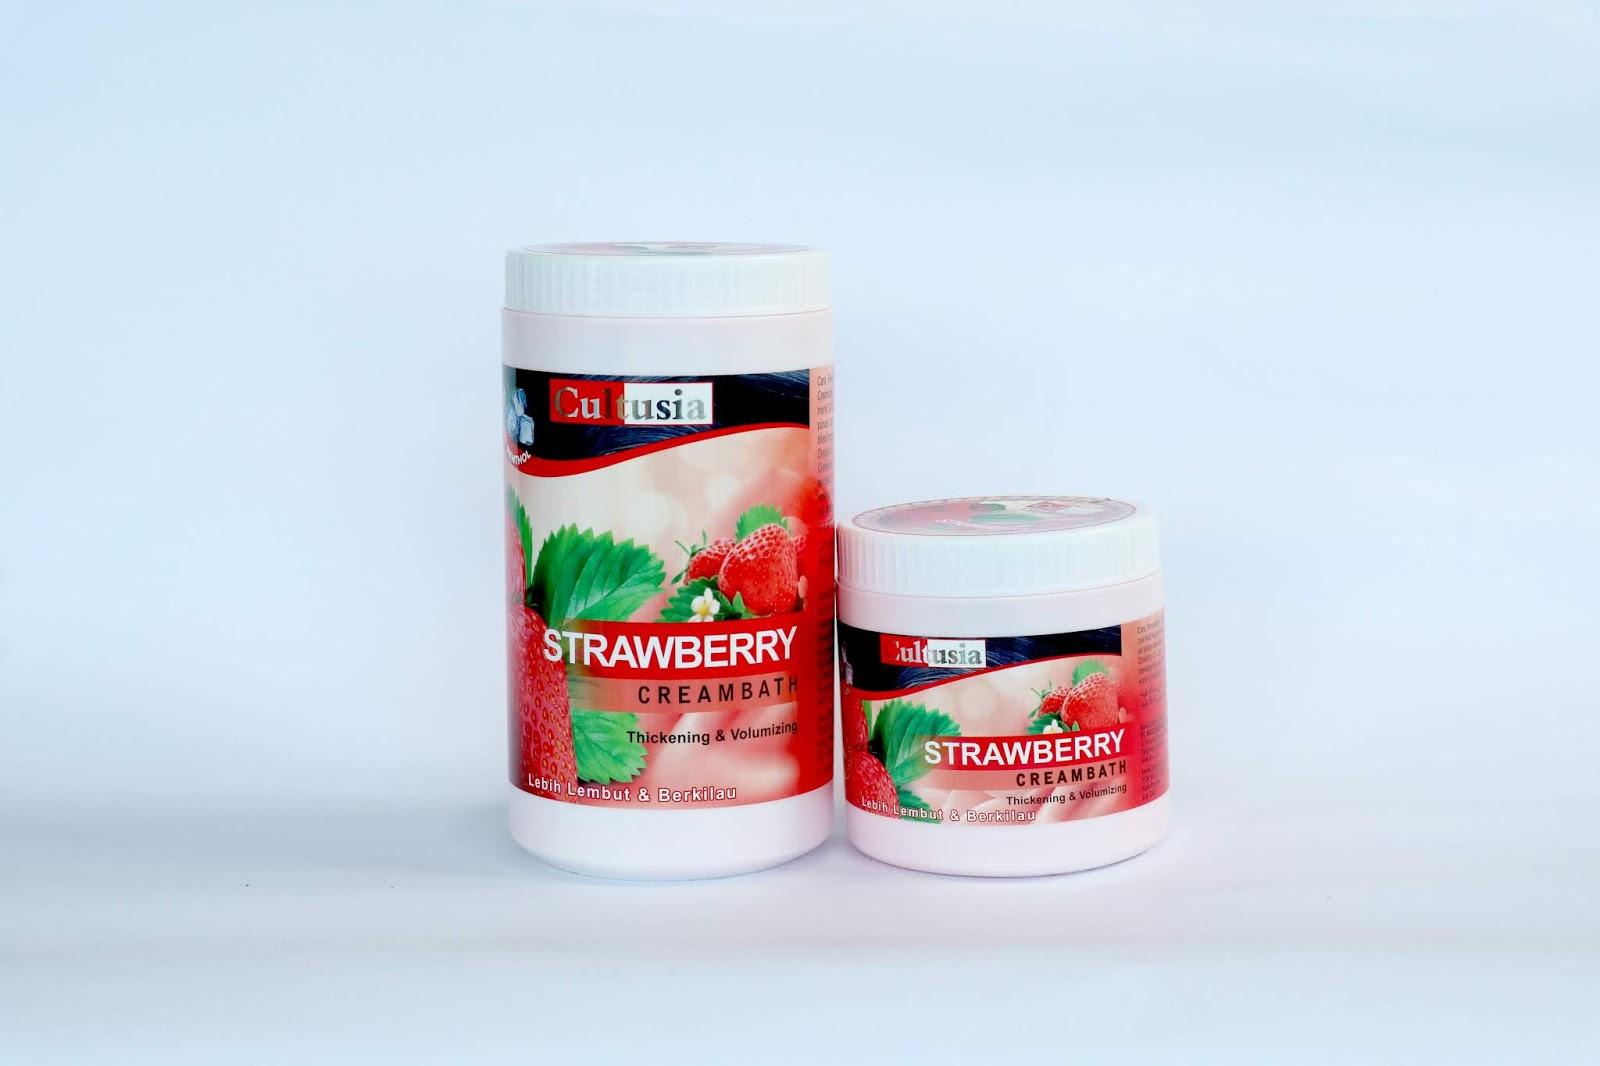 Rudy Hizkia Manfaat Cultusia Creambath Strawberry